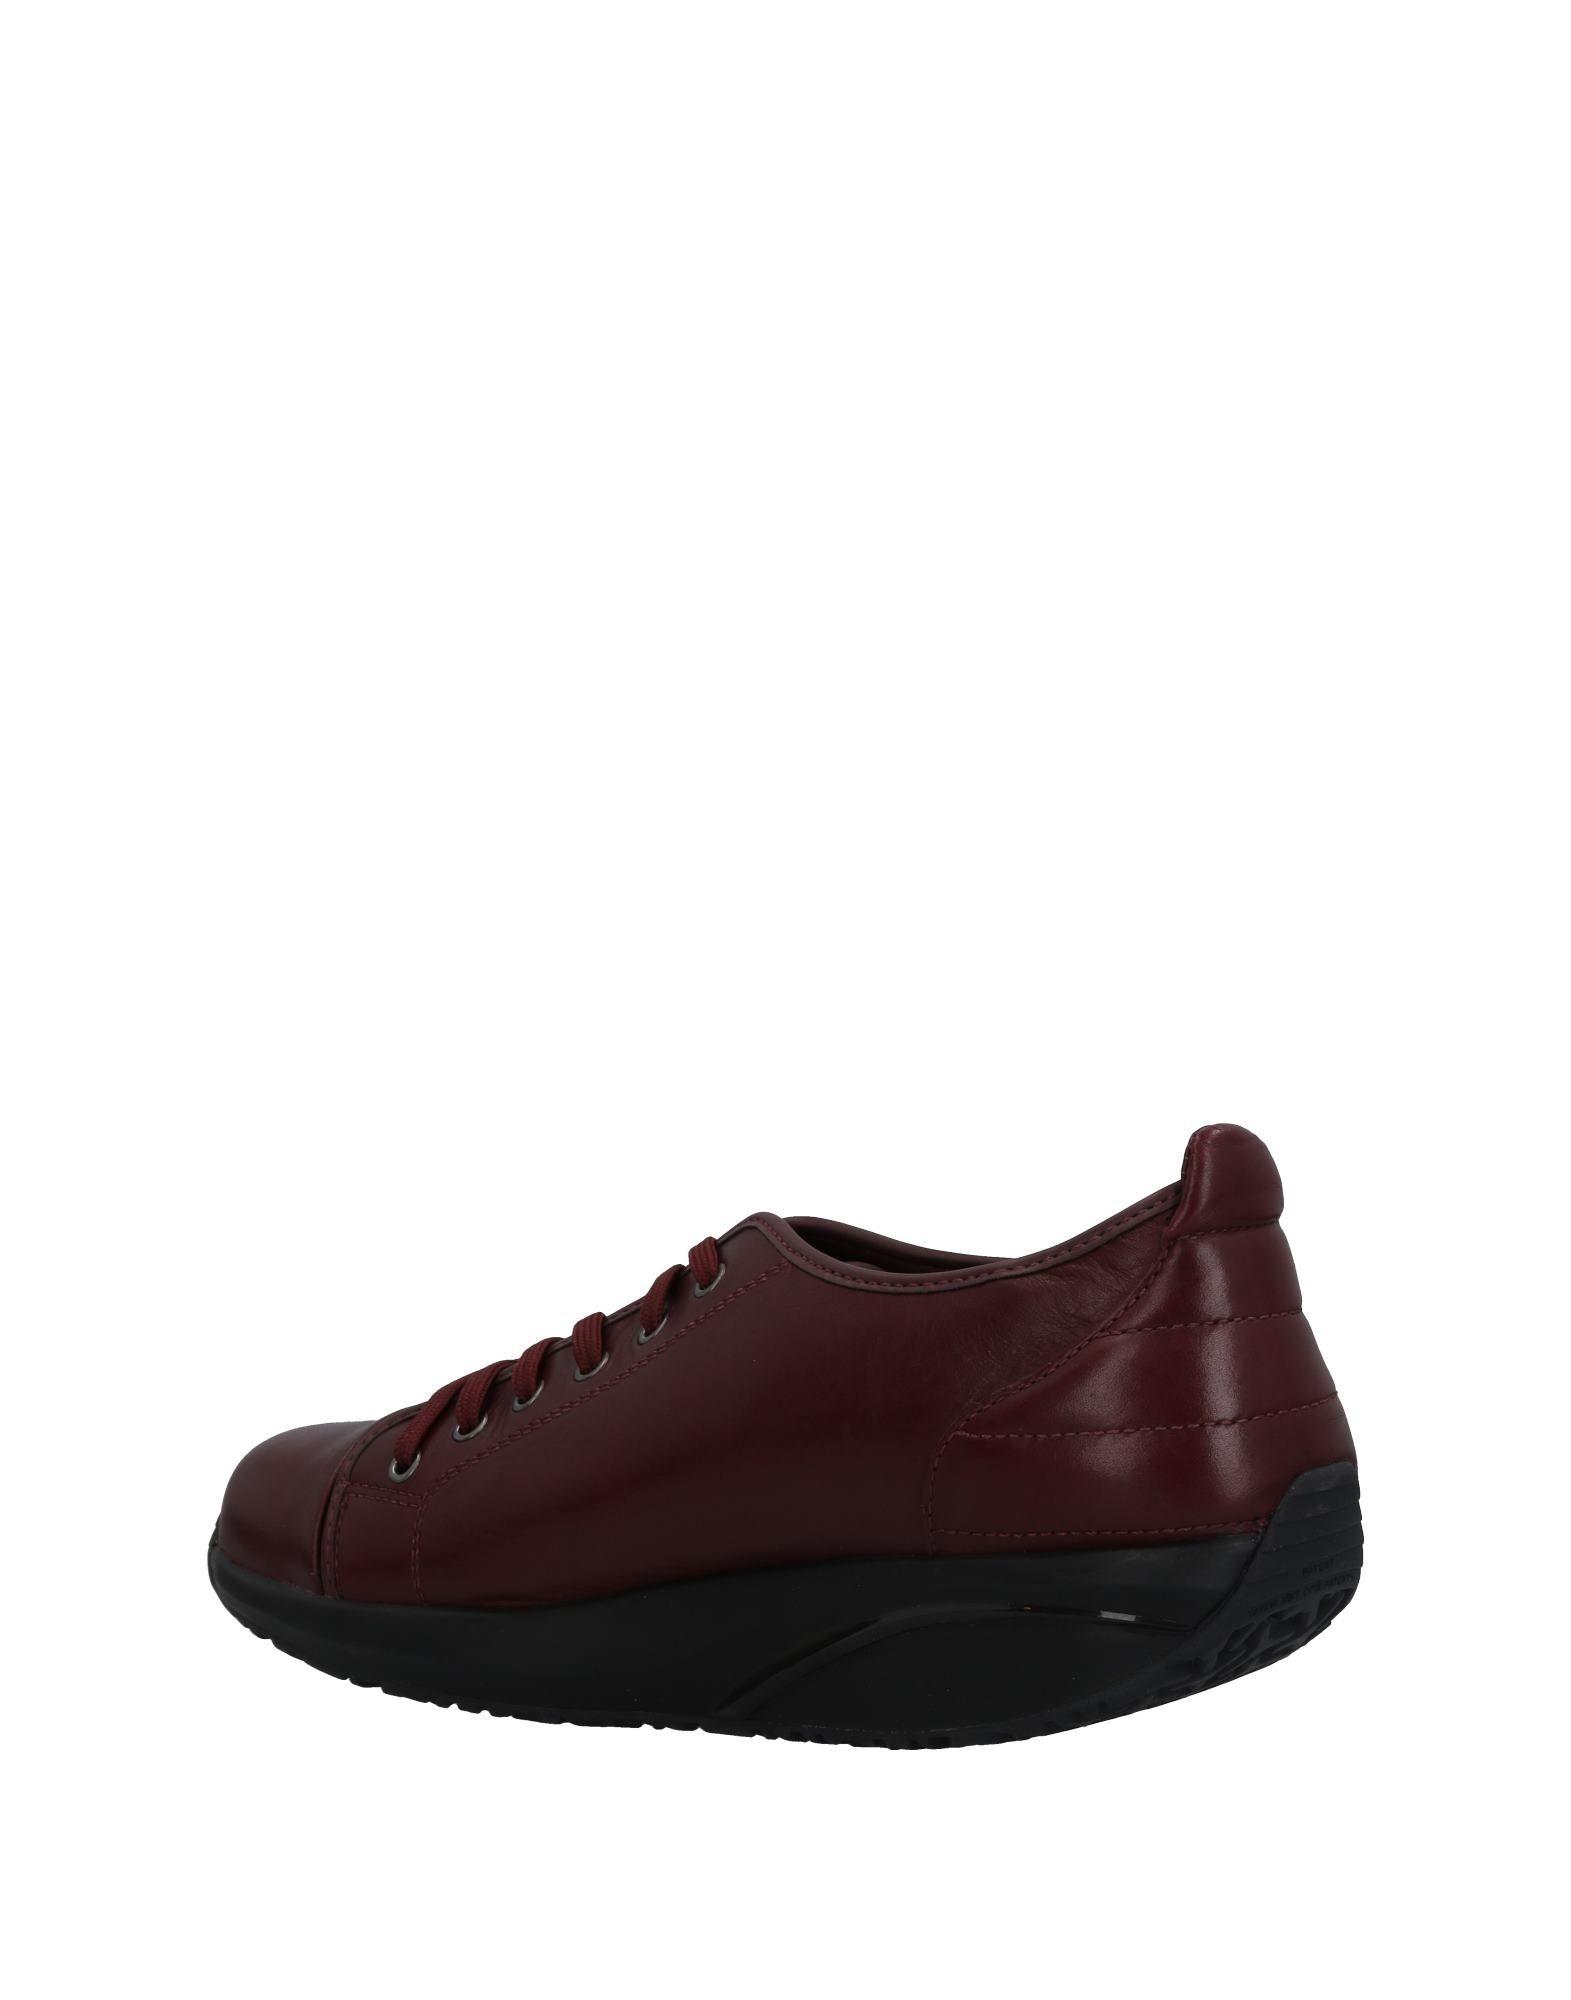 Mbt Sneakers Damen Damen Sneakers  11458231HM  b4de51